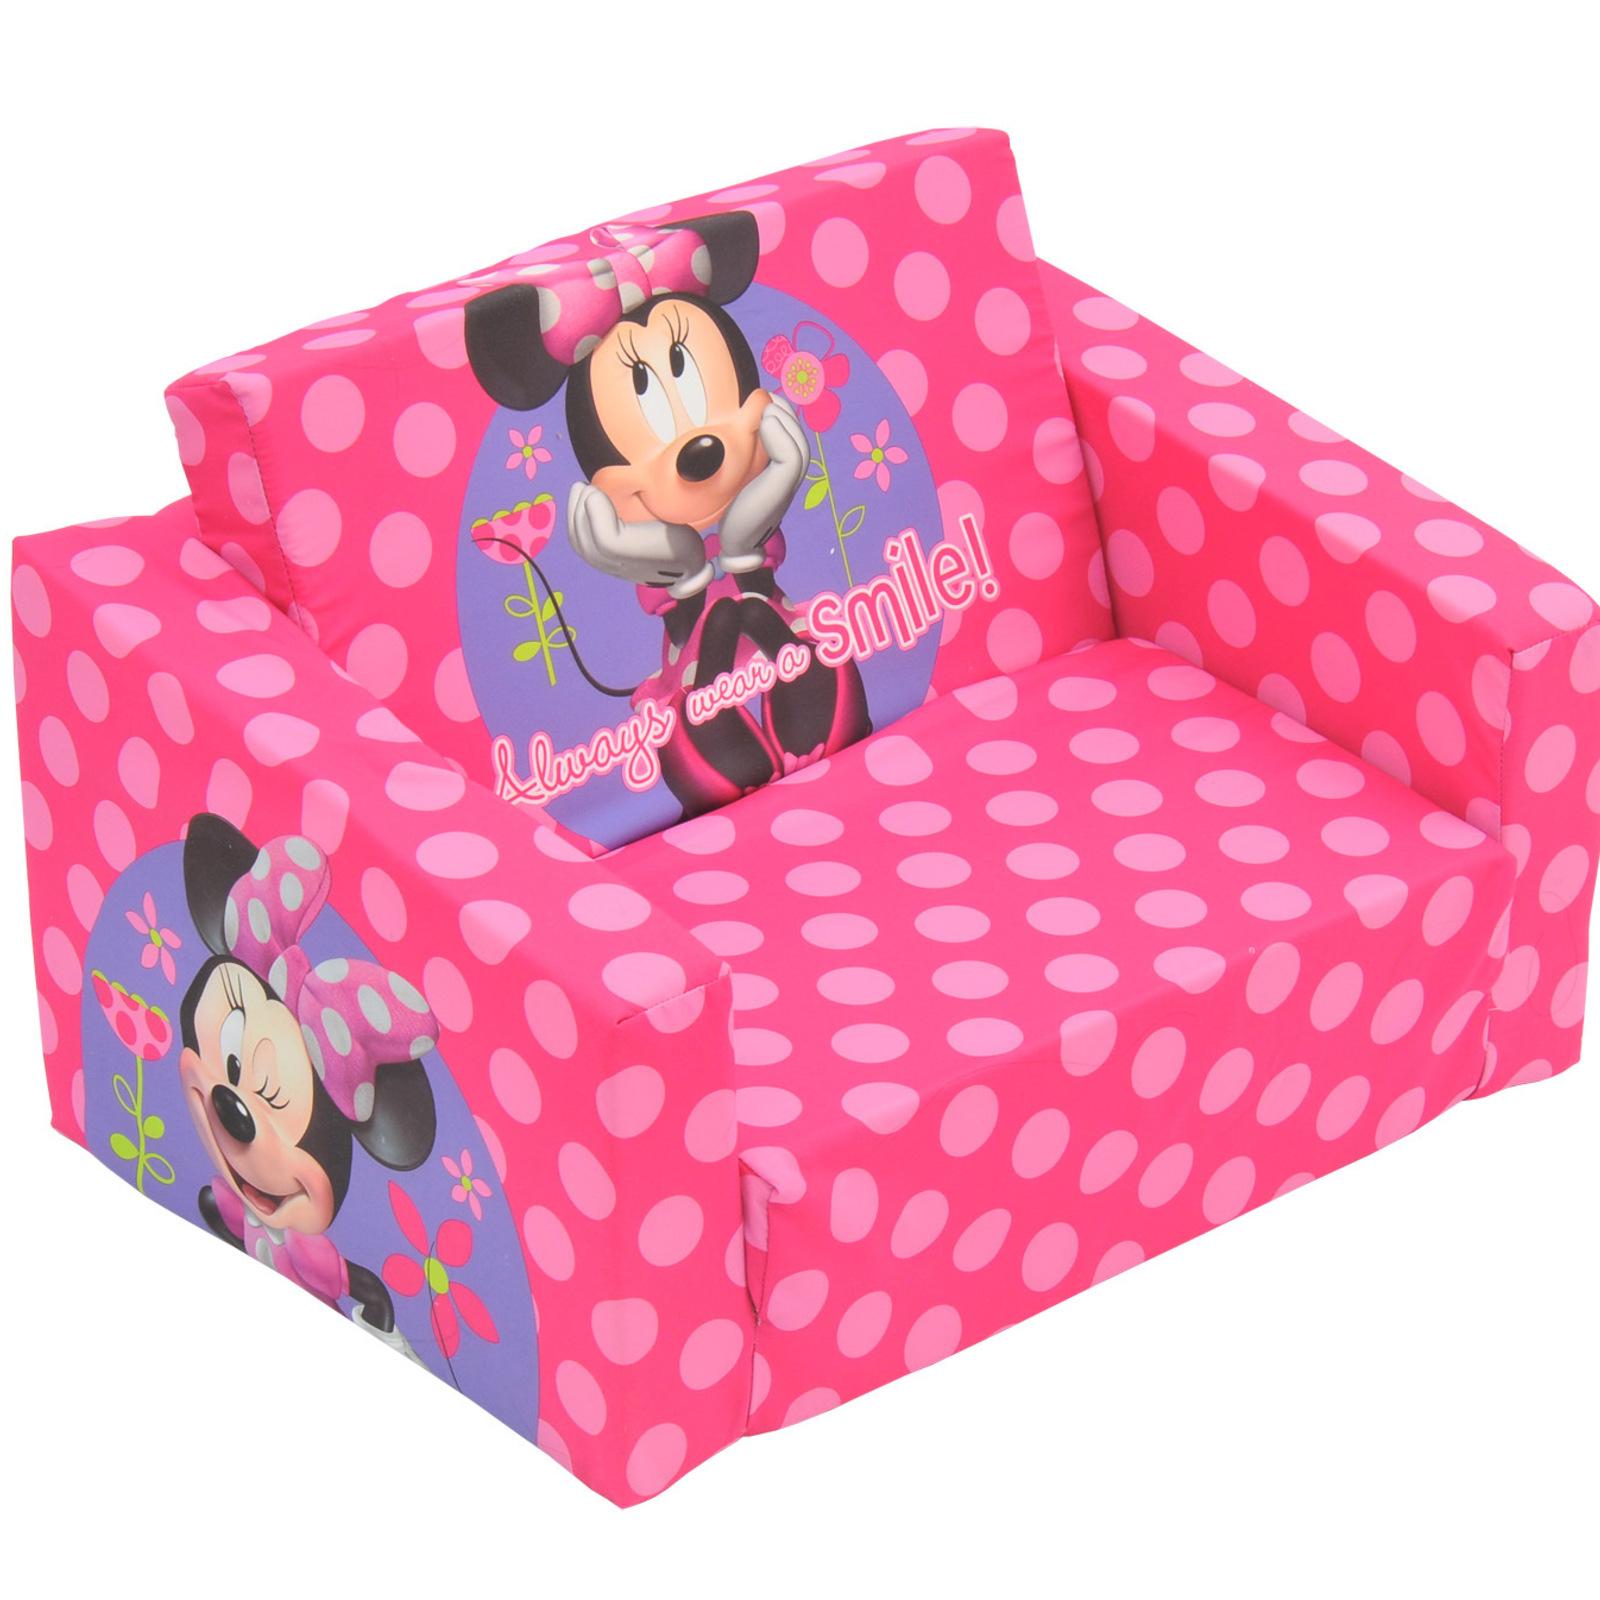 Disney Minnie Mouse Kids Flip Out Sofa